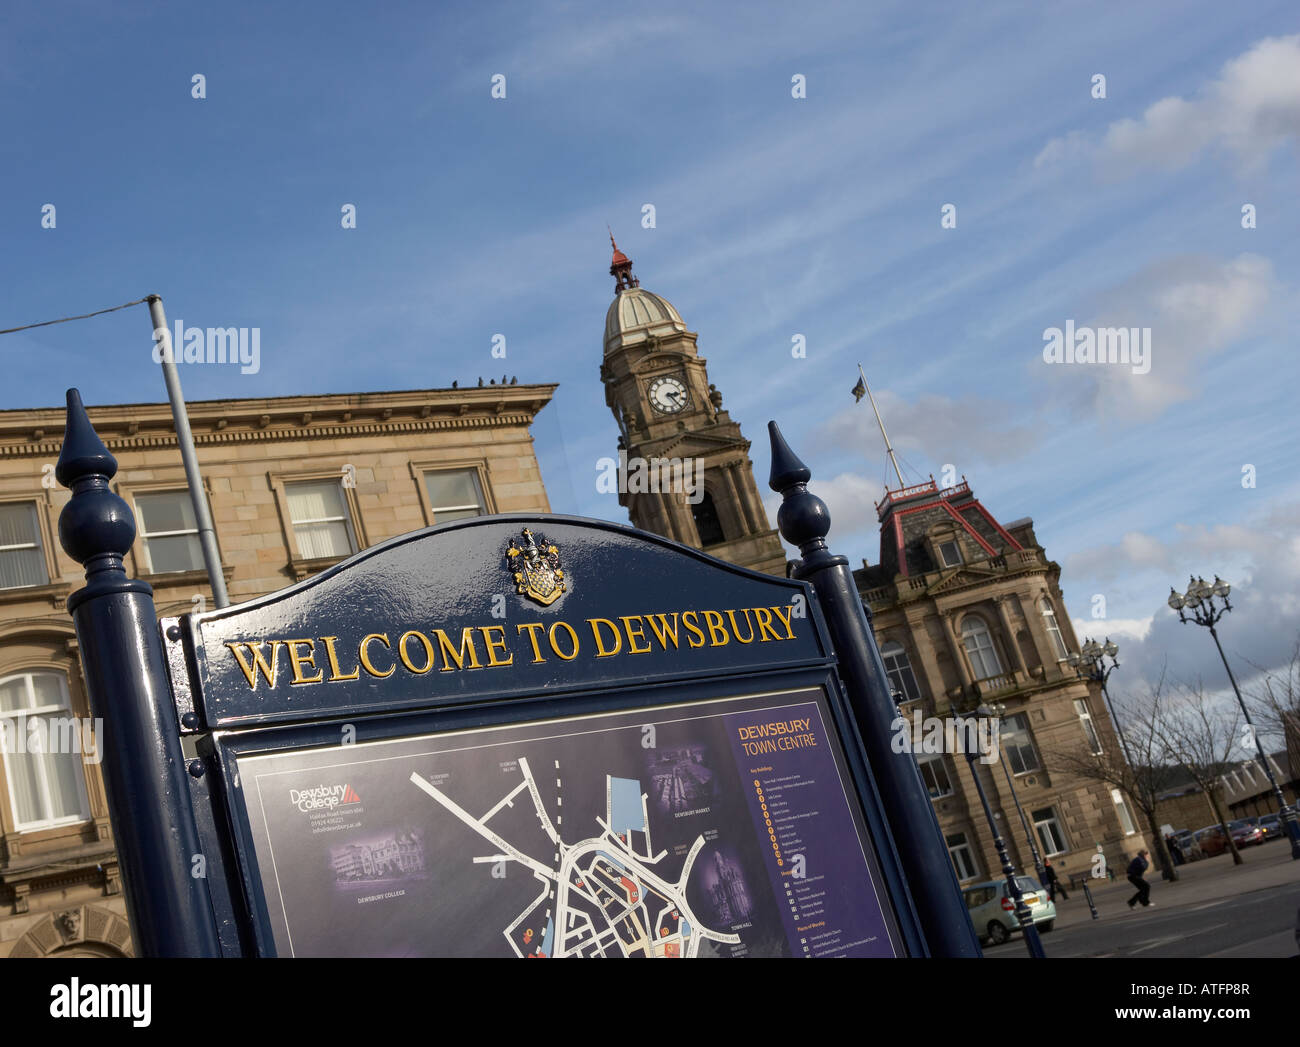 DEWSBURY TOWN HALL - Stock Image